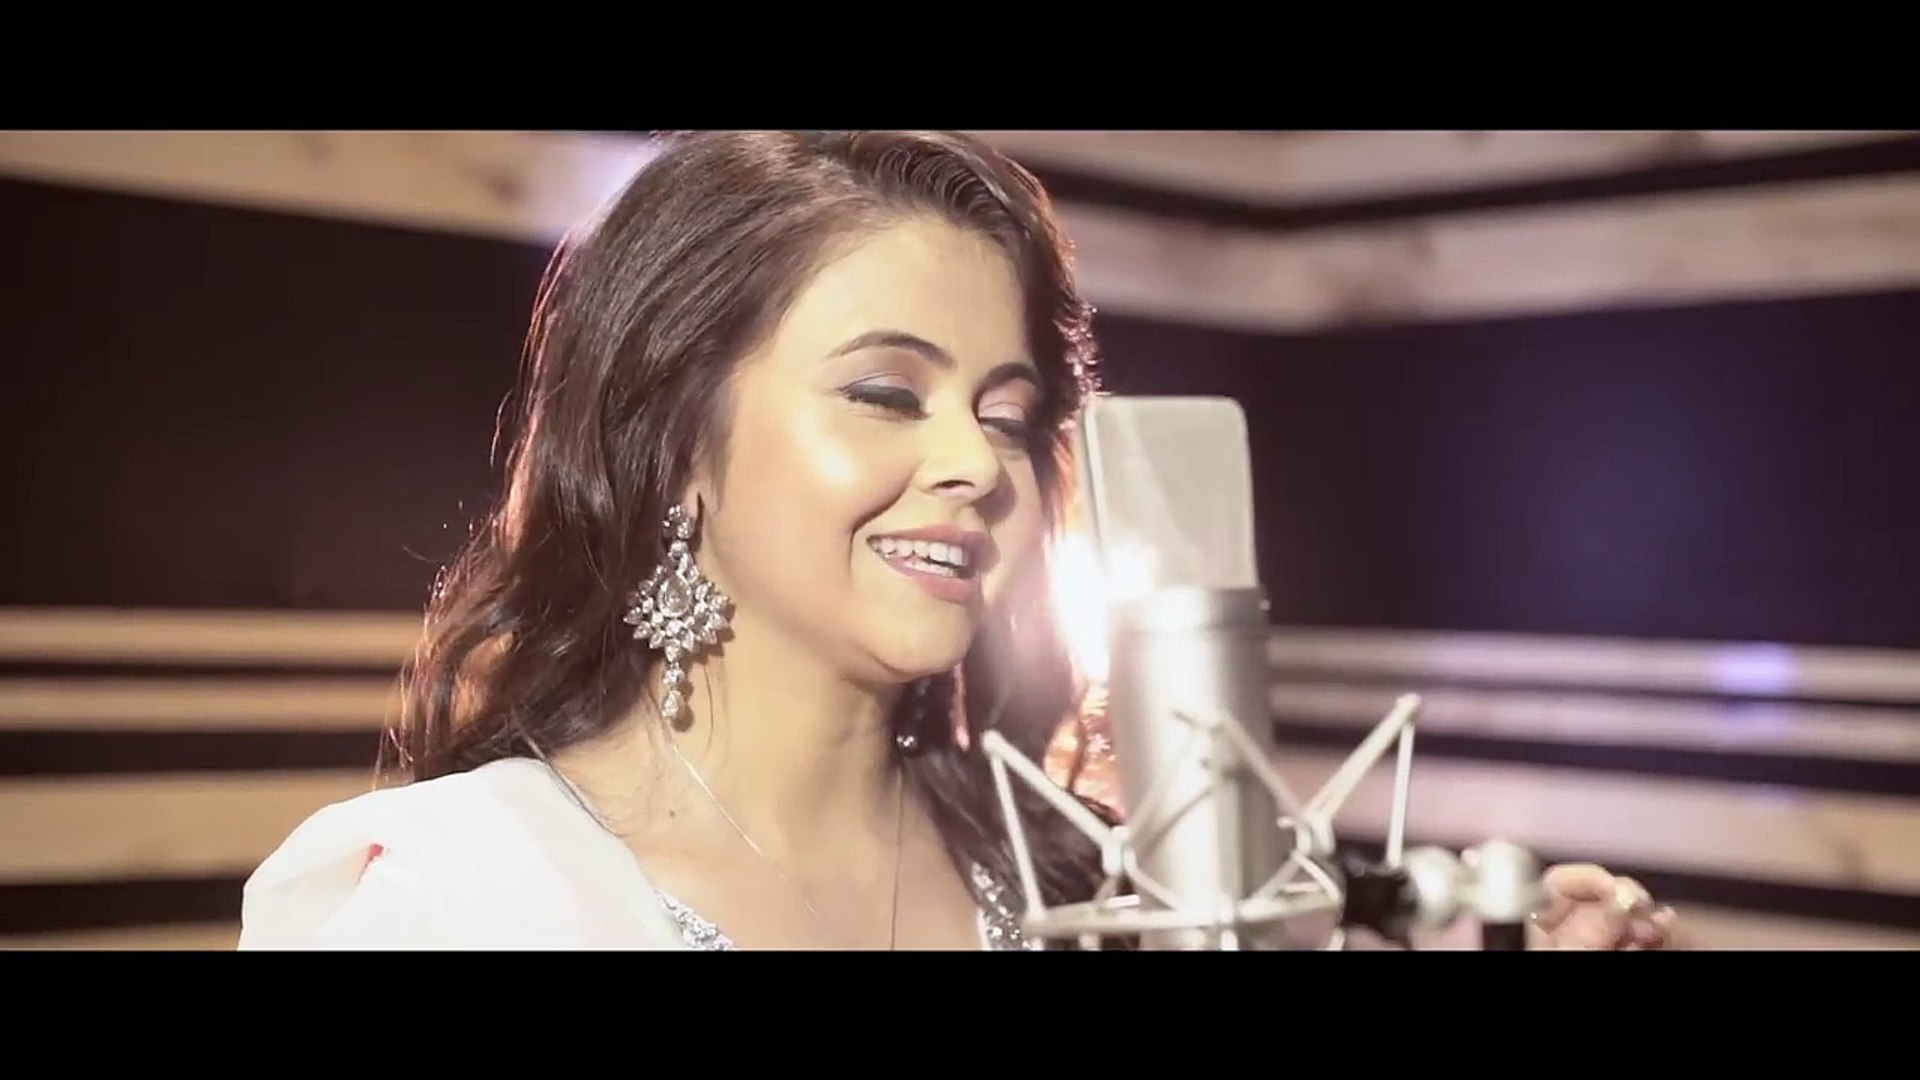 Hey Gopal Krishna Karu Aarti Teri Devoleena Bhattacharjee Sarthak Films Entertainment Official Video Dailymotion